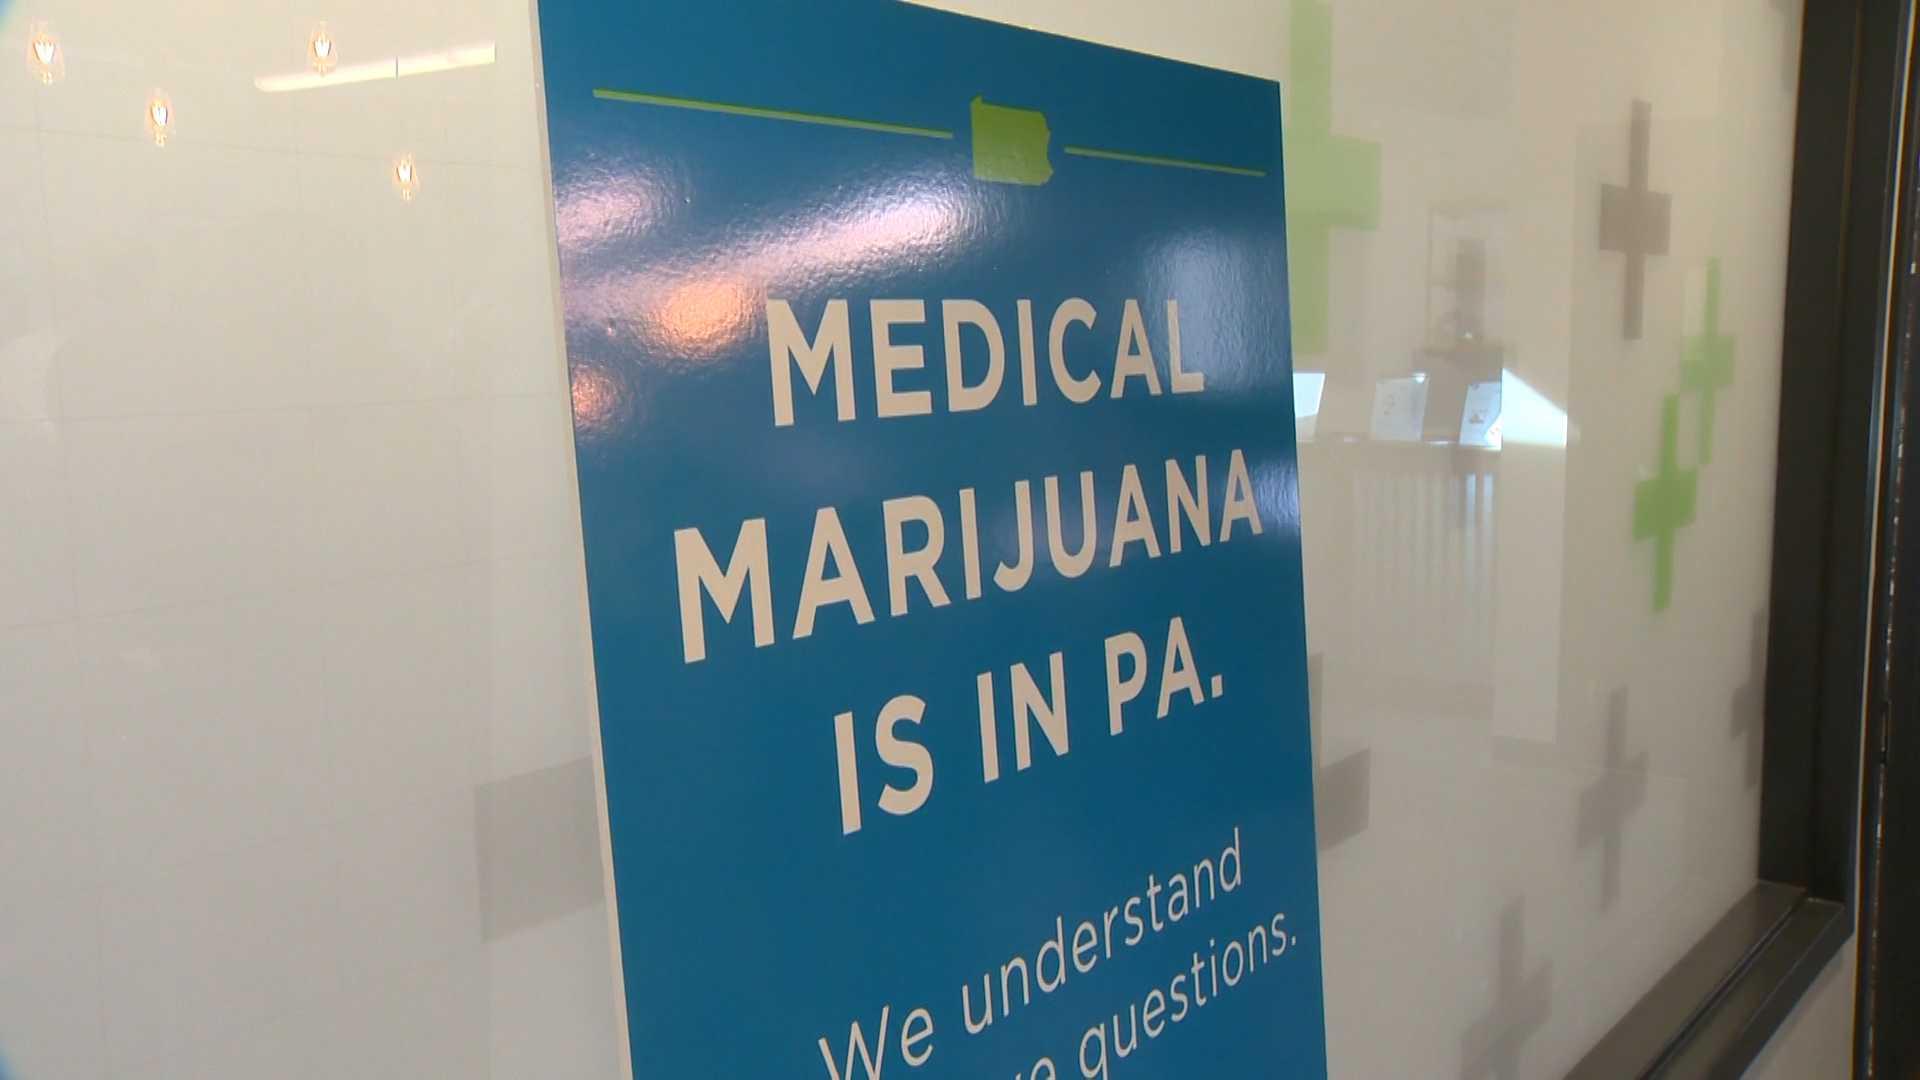 Medical marijuana law changes get through Pennsylvania House